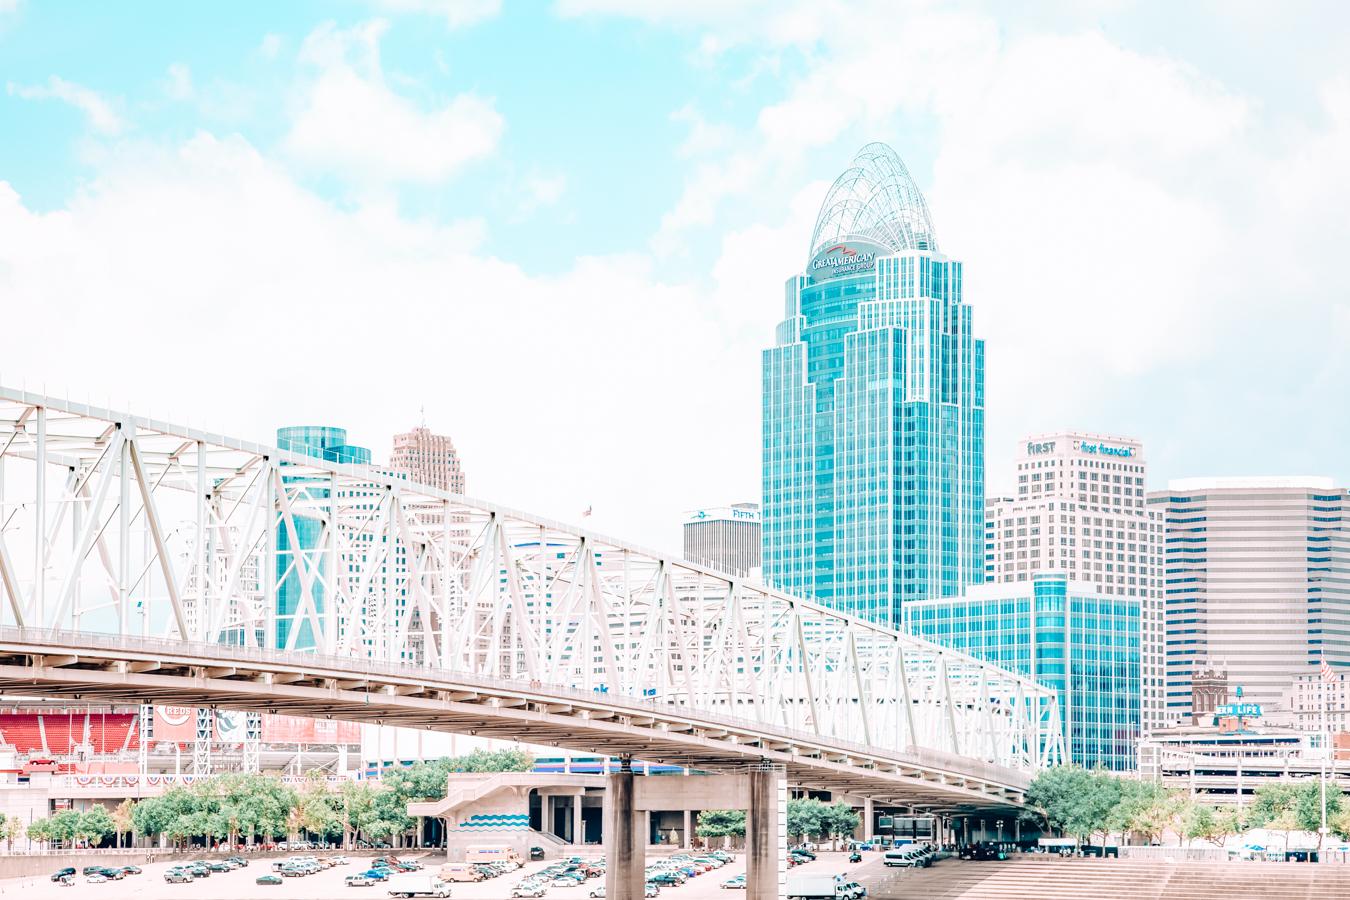 Bridge and building in Cincinnati